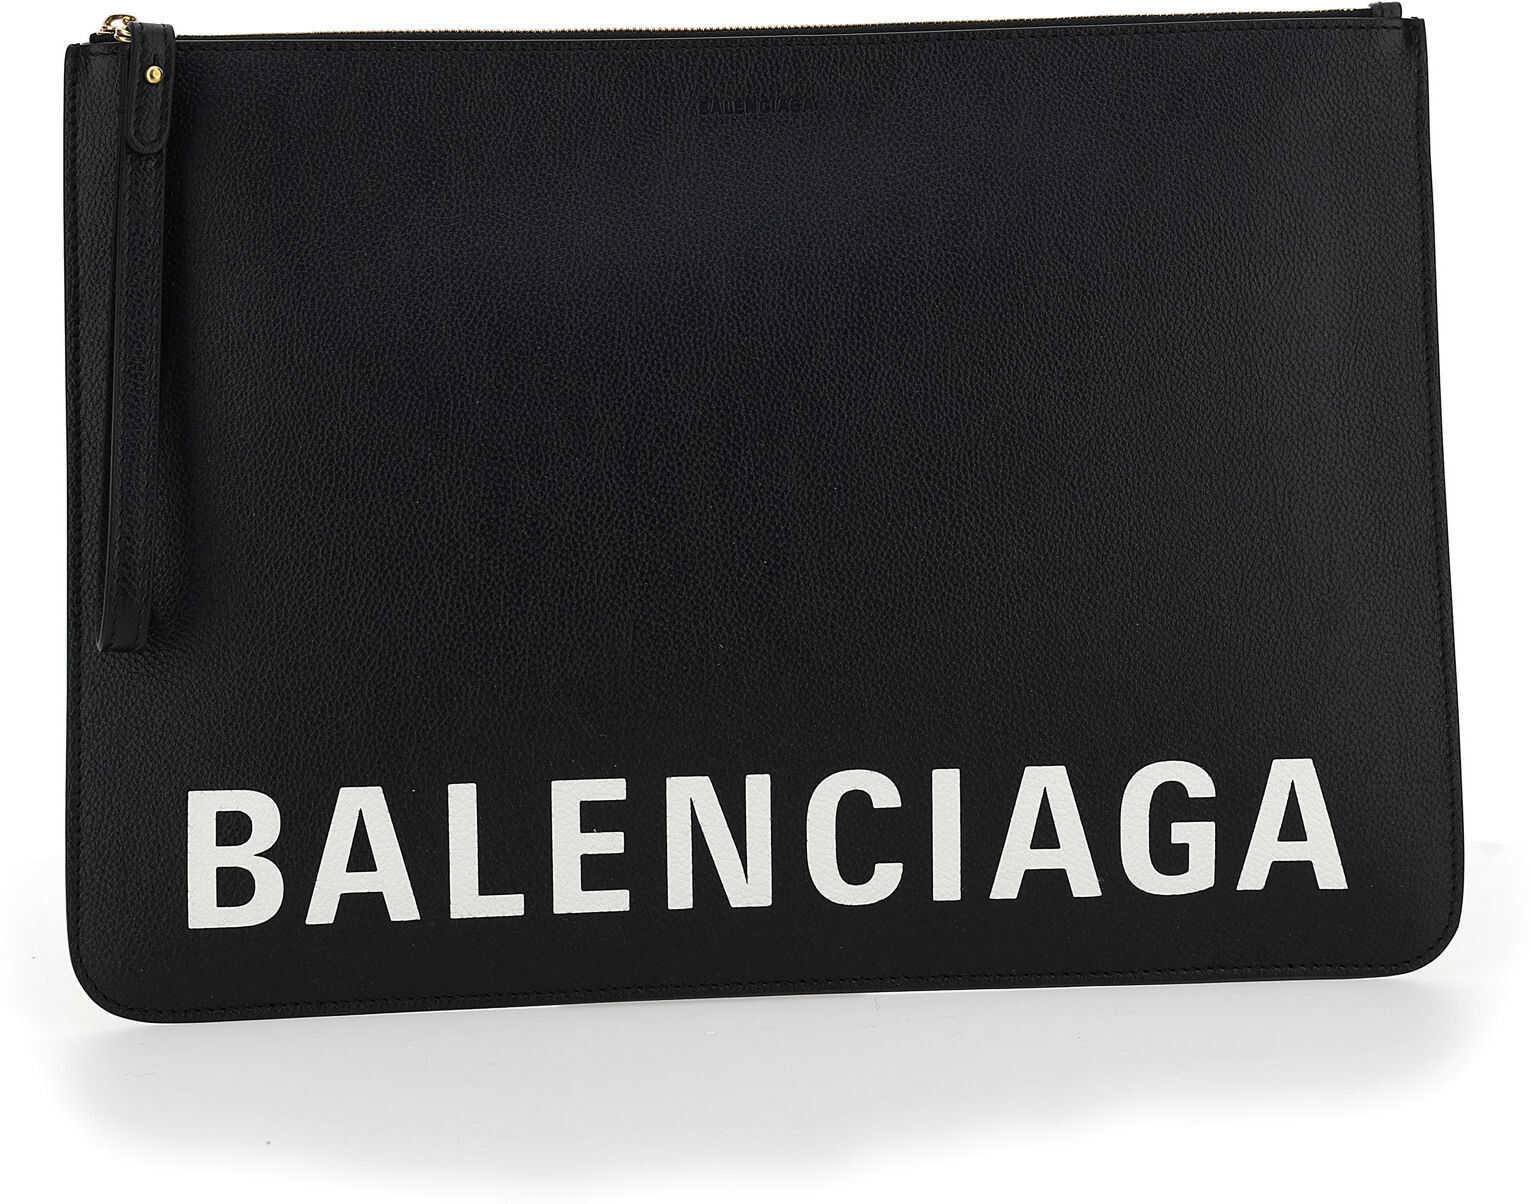 Balenciaga Pouch 6306261IZKM N/A imagine b-mall.ro